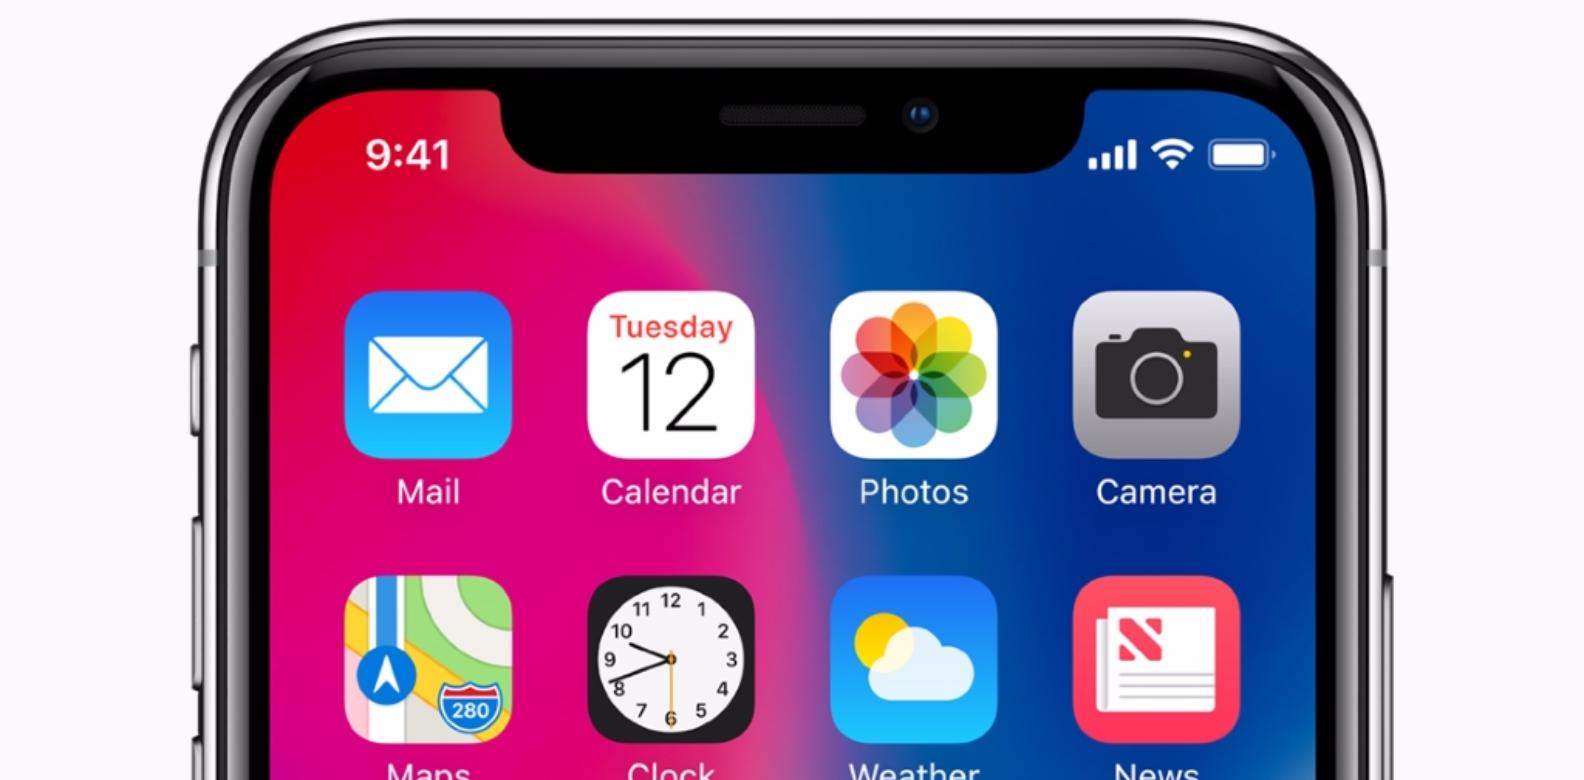 Apple iPhone X (Image credits to Apple)